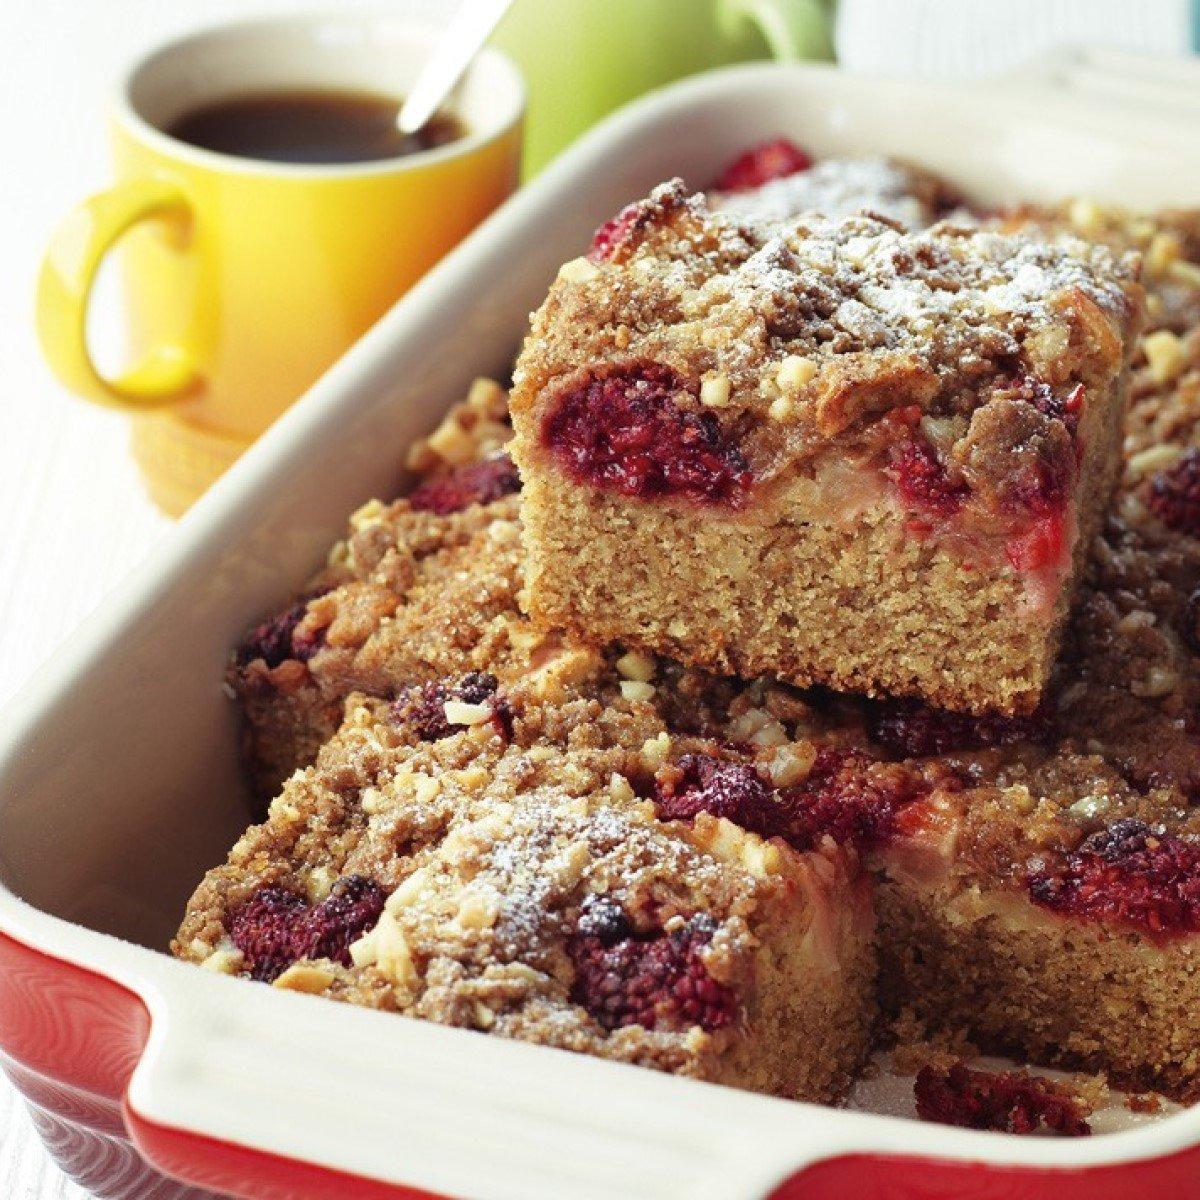 Raspberry and Apple Streusel Tray Bake Recipe